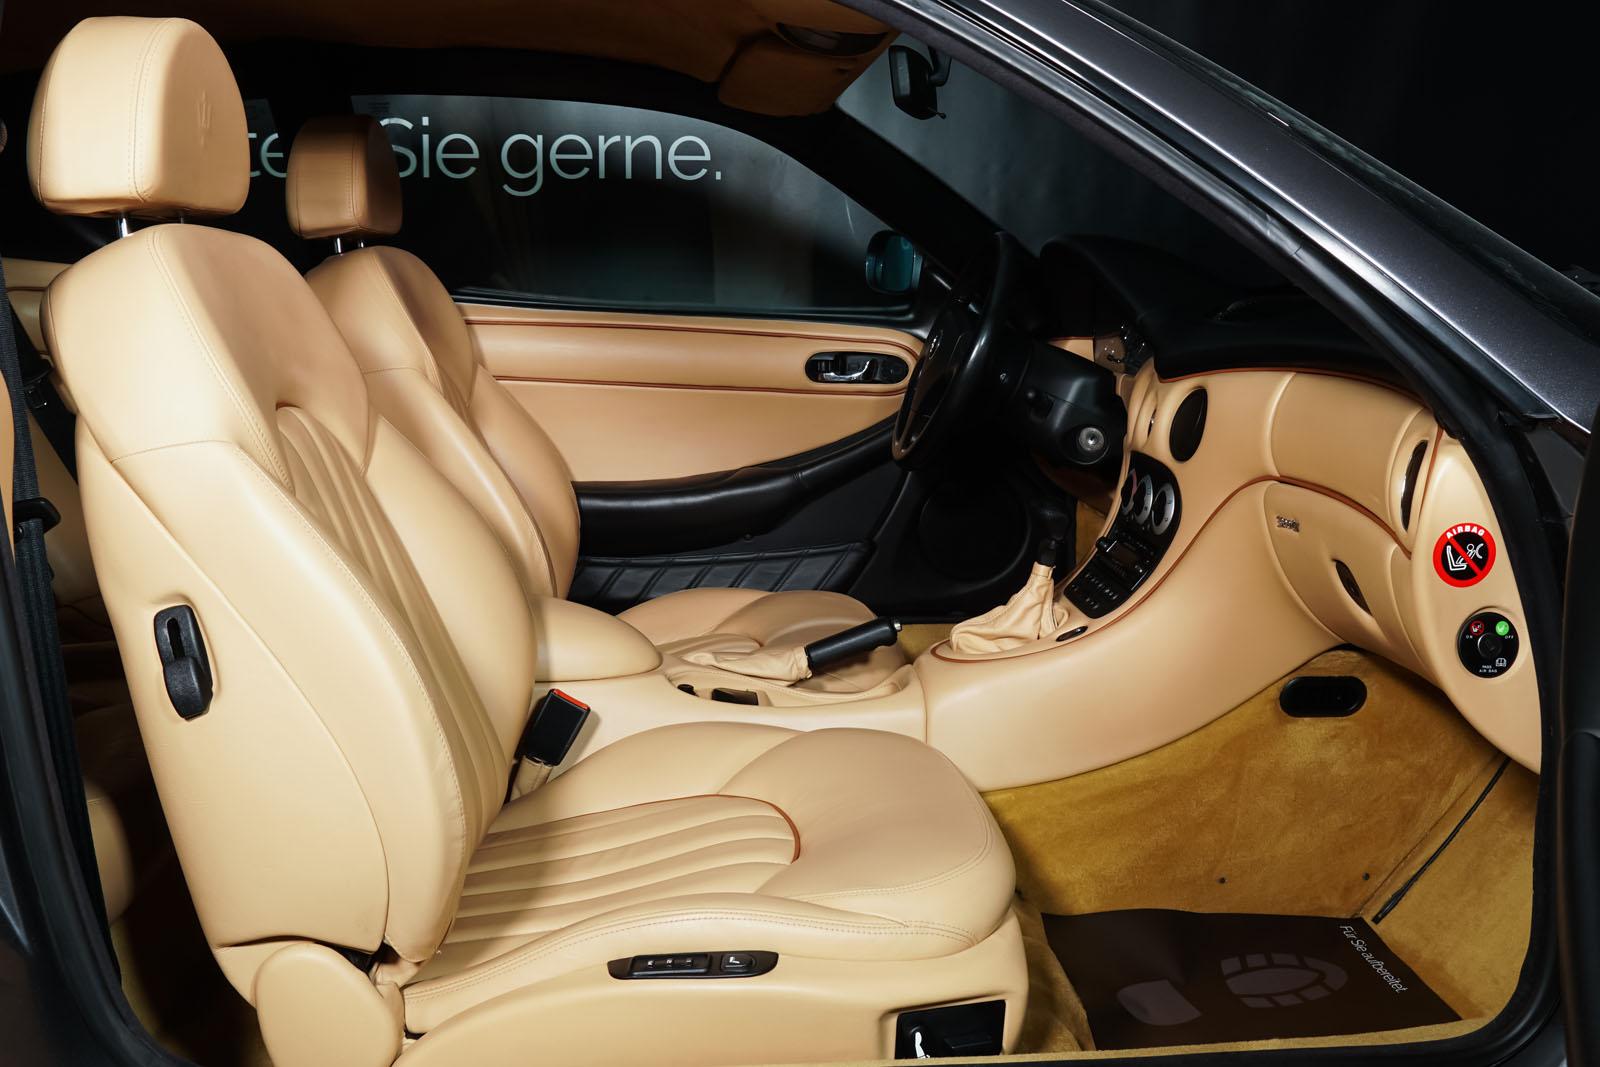 Maserati_3200_GTA_Grau_Beige_MAS-0874_18_w